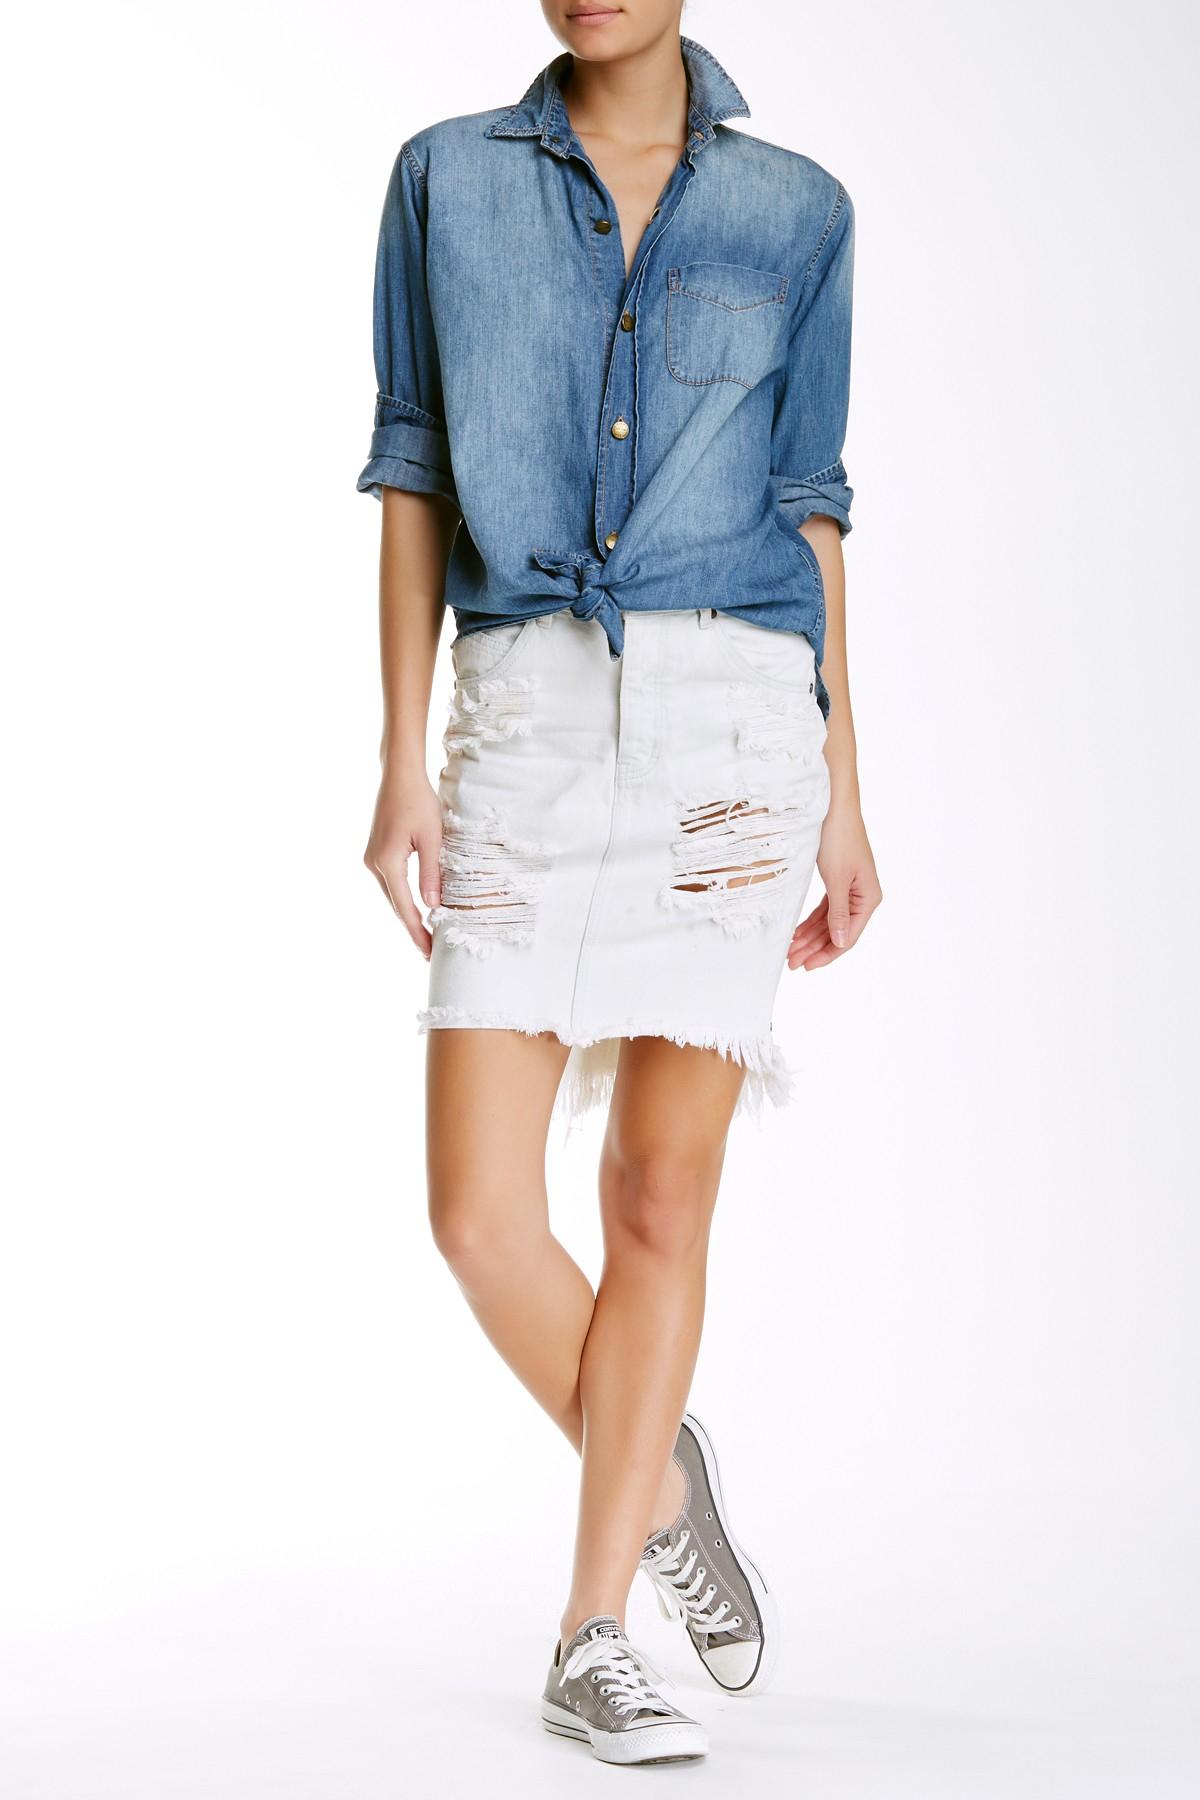 Lyst - One Teaspoon 2020 Skirt in White